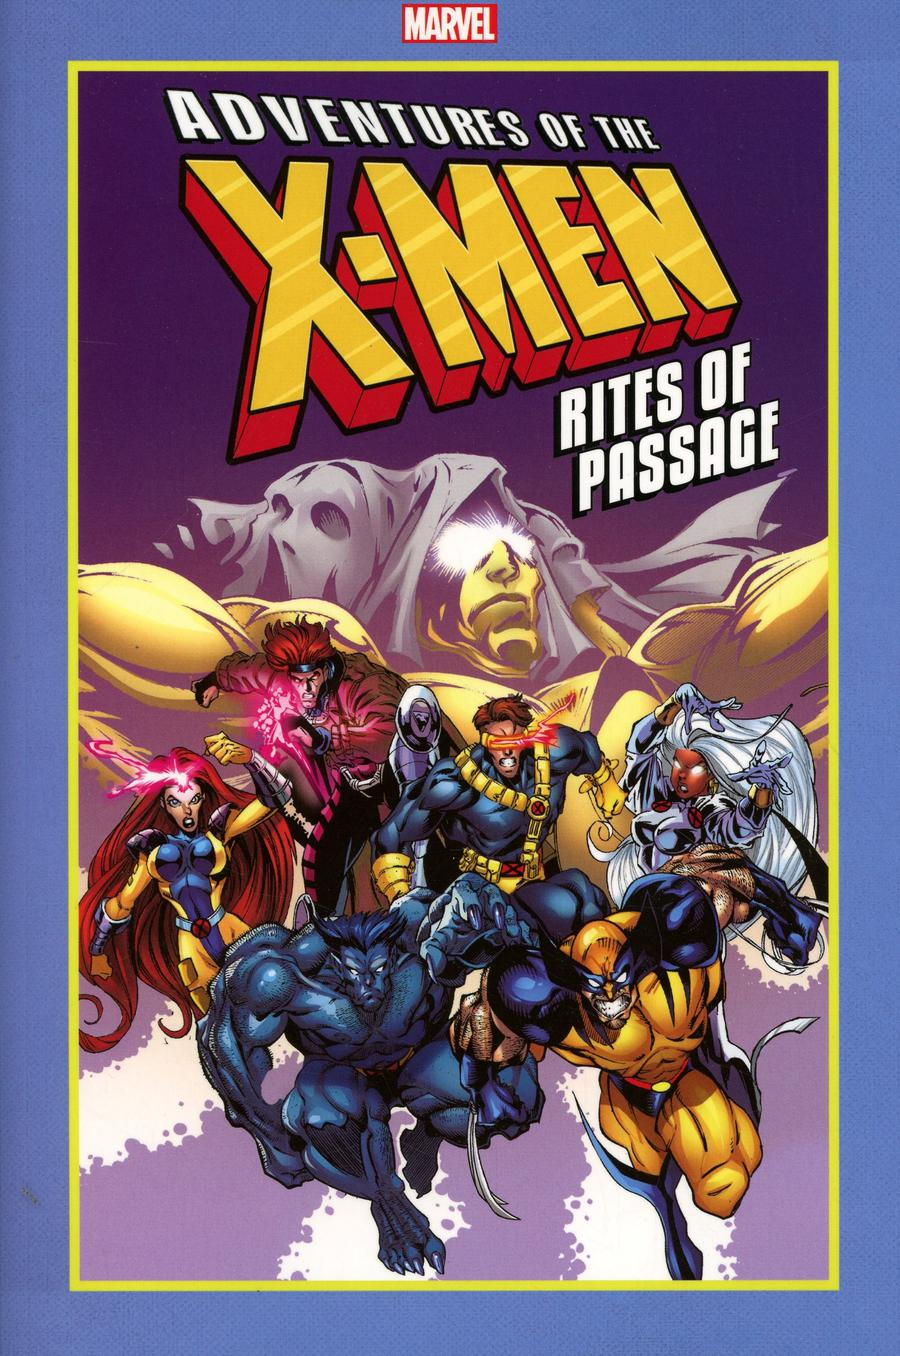 Adventures Of The X-Men Rites Of Passage GN